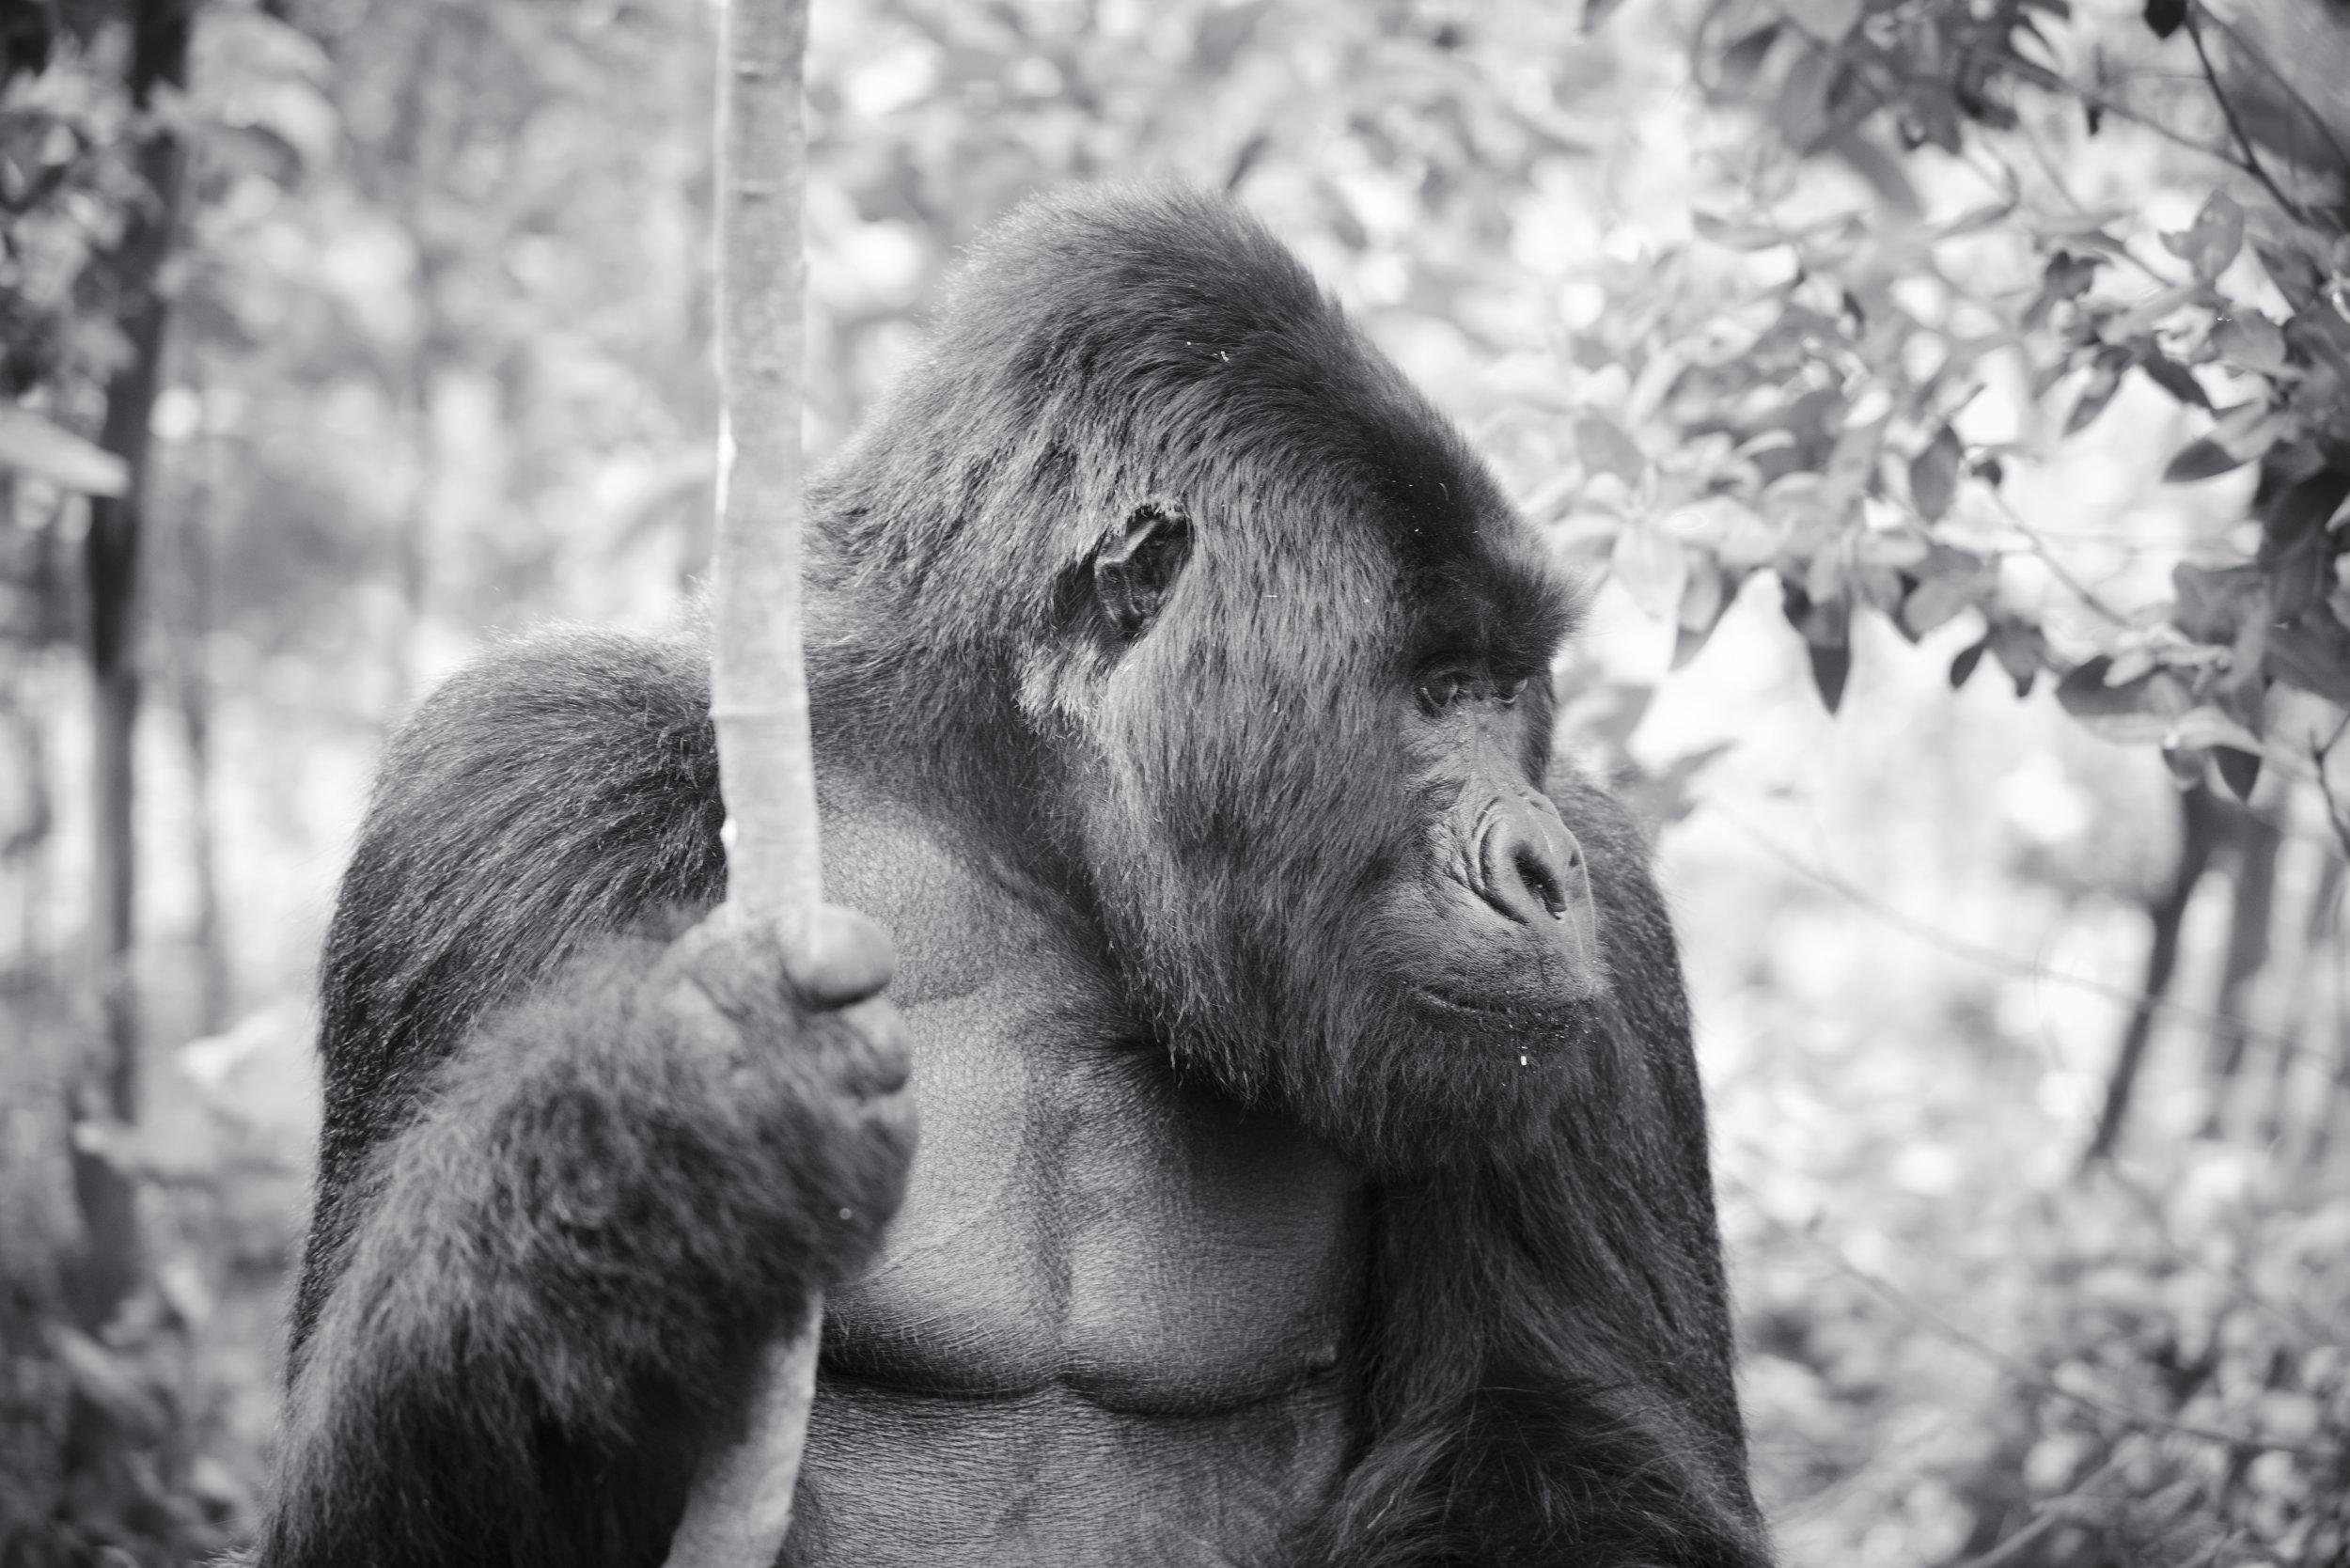 Visit with the Mountain Gorillas, Rwanda